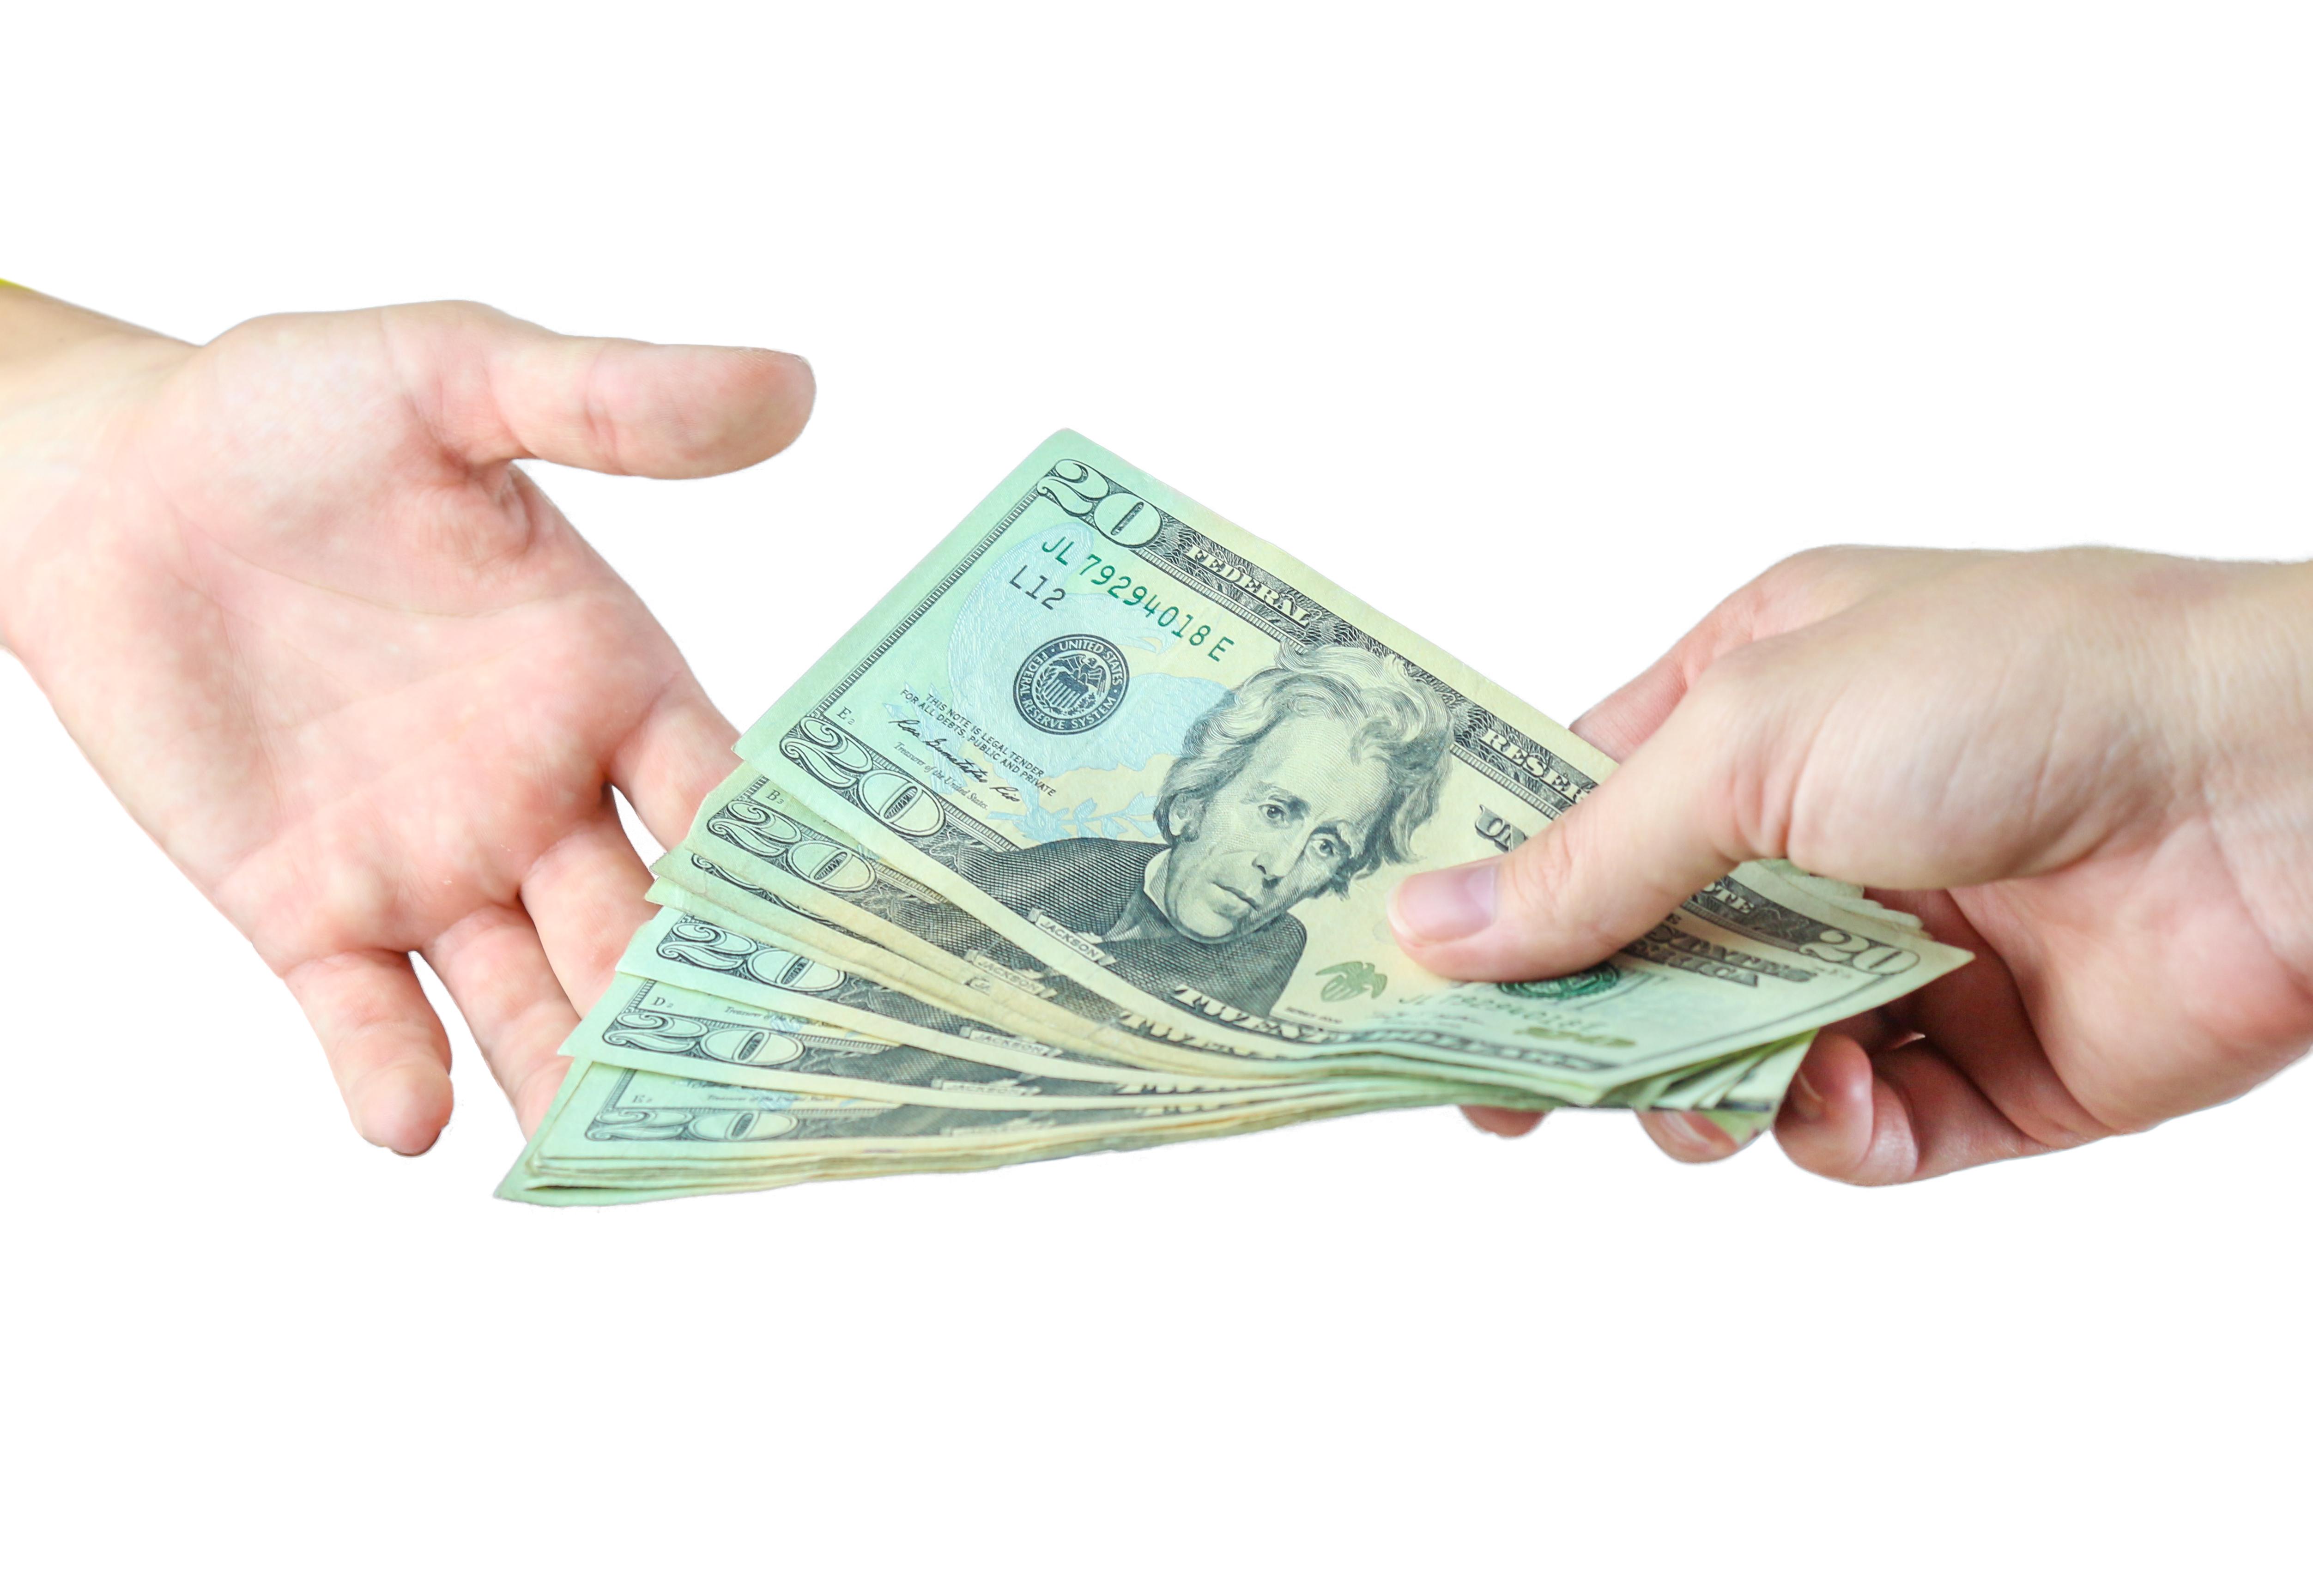 Money changing hands.